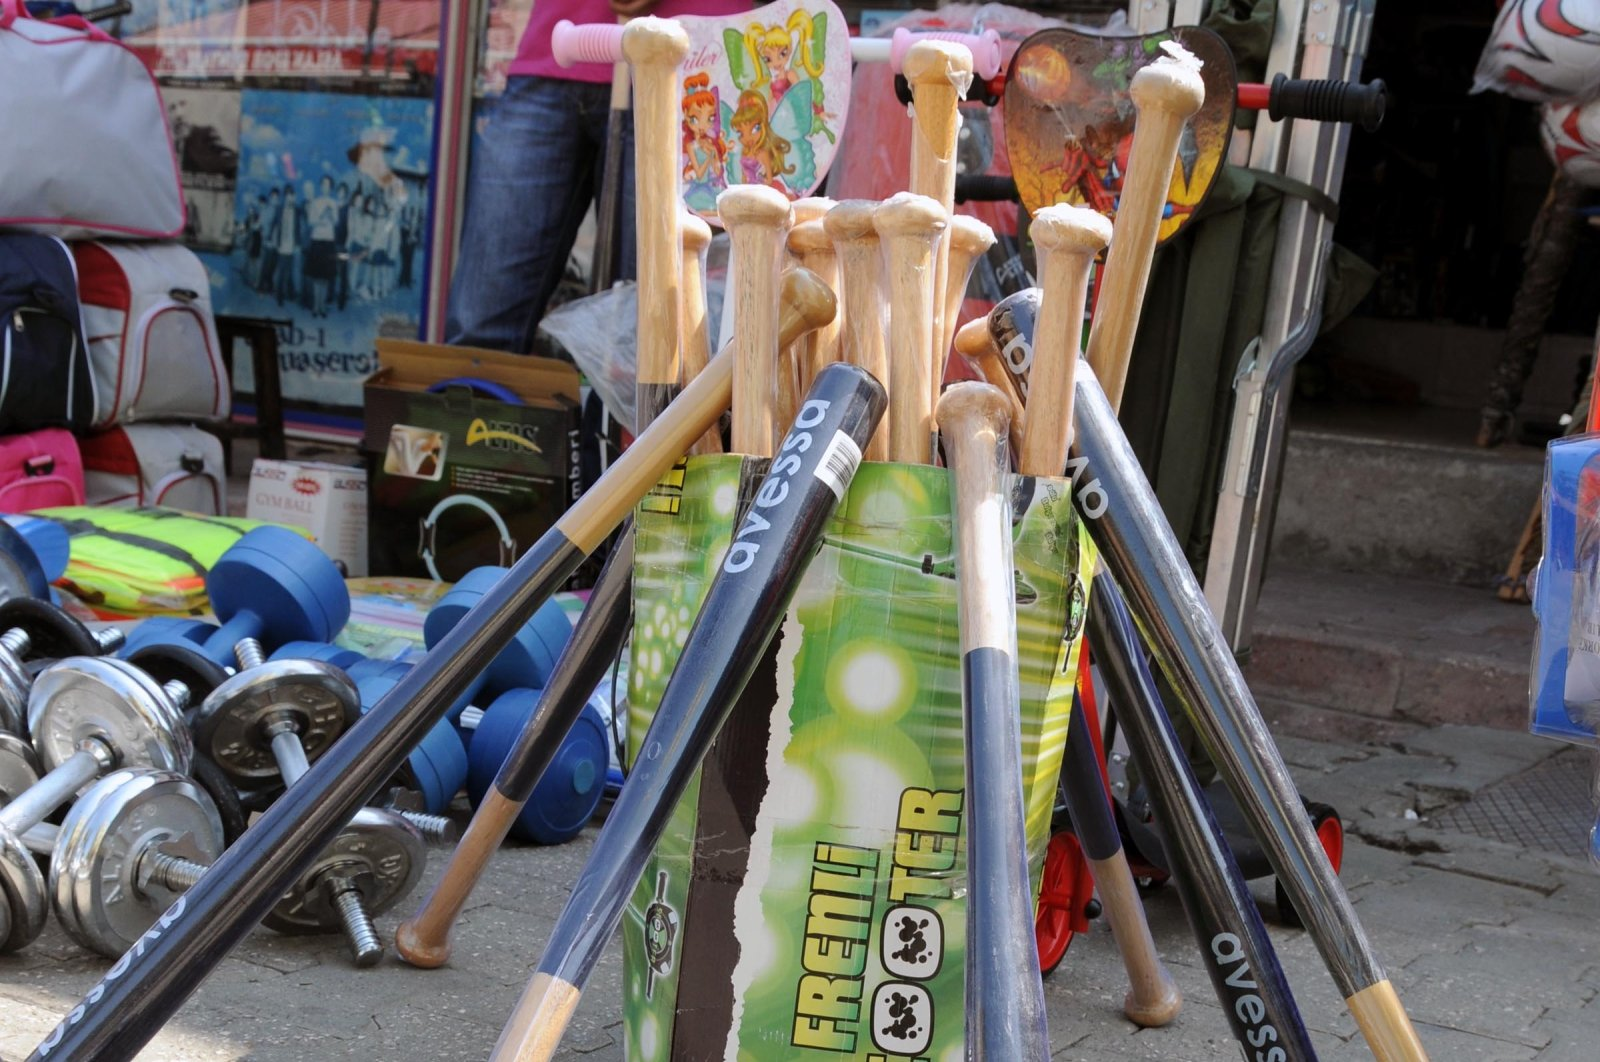 Baseball bats on display outside a shop in Adana, southern Turkey, Aug. 20, 2020. (DHA Photo)